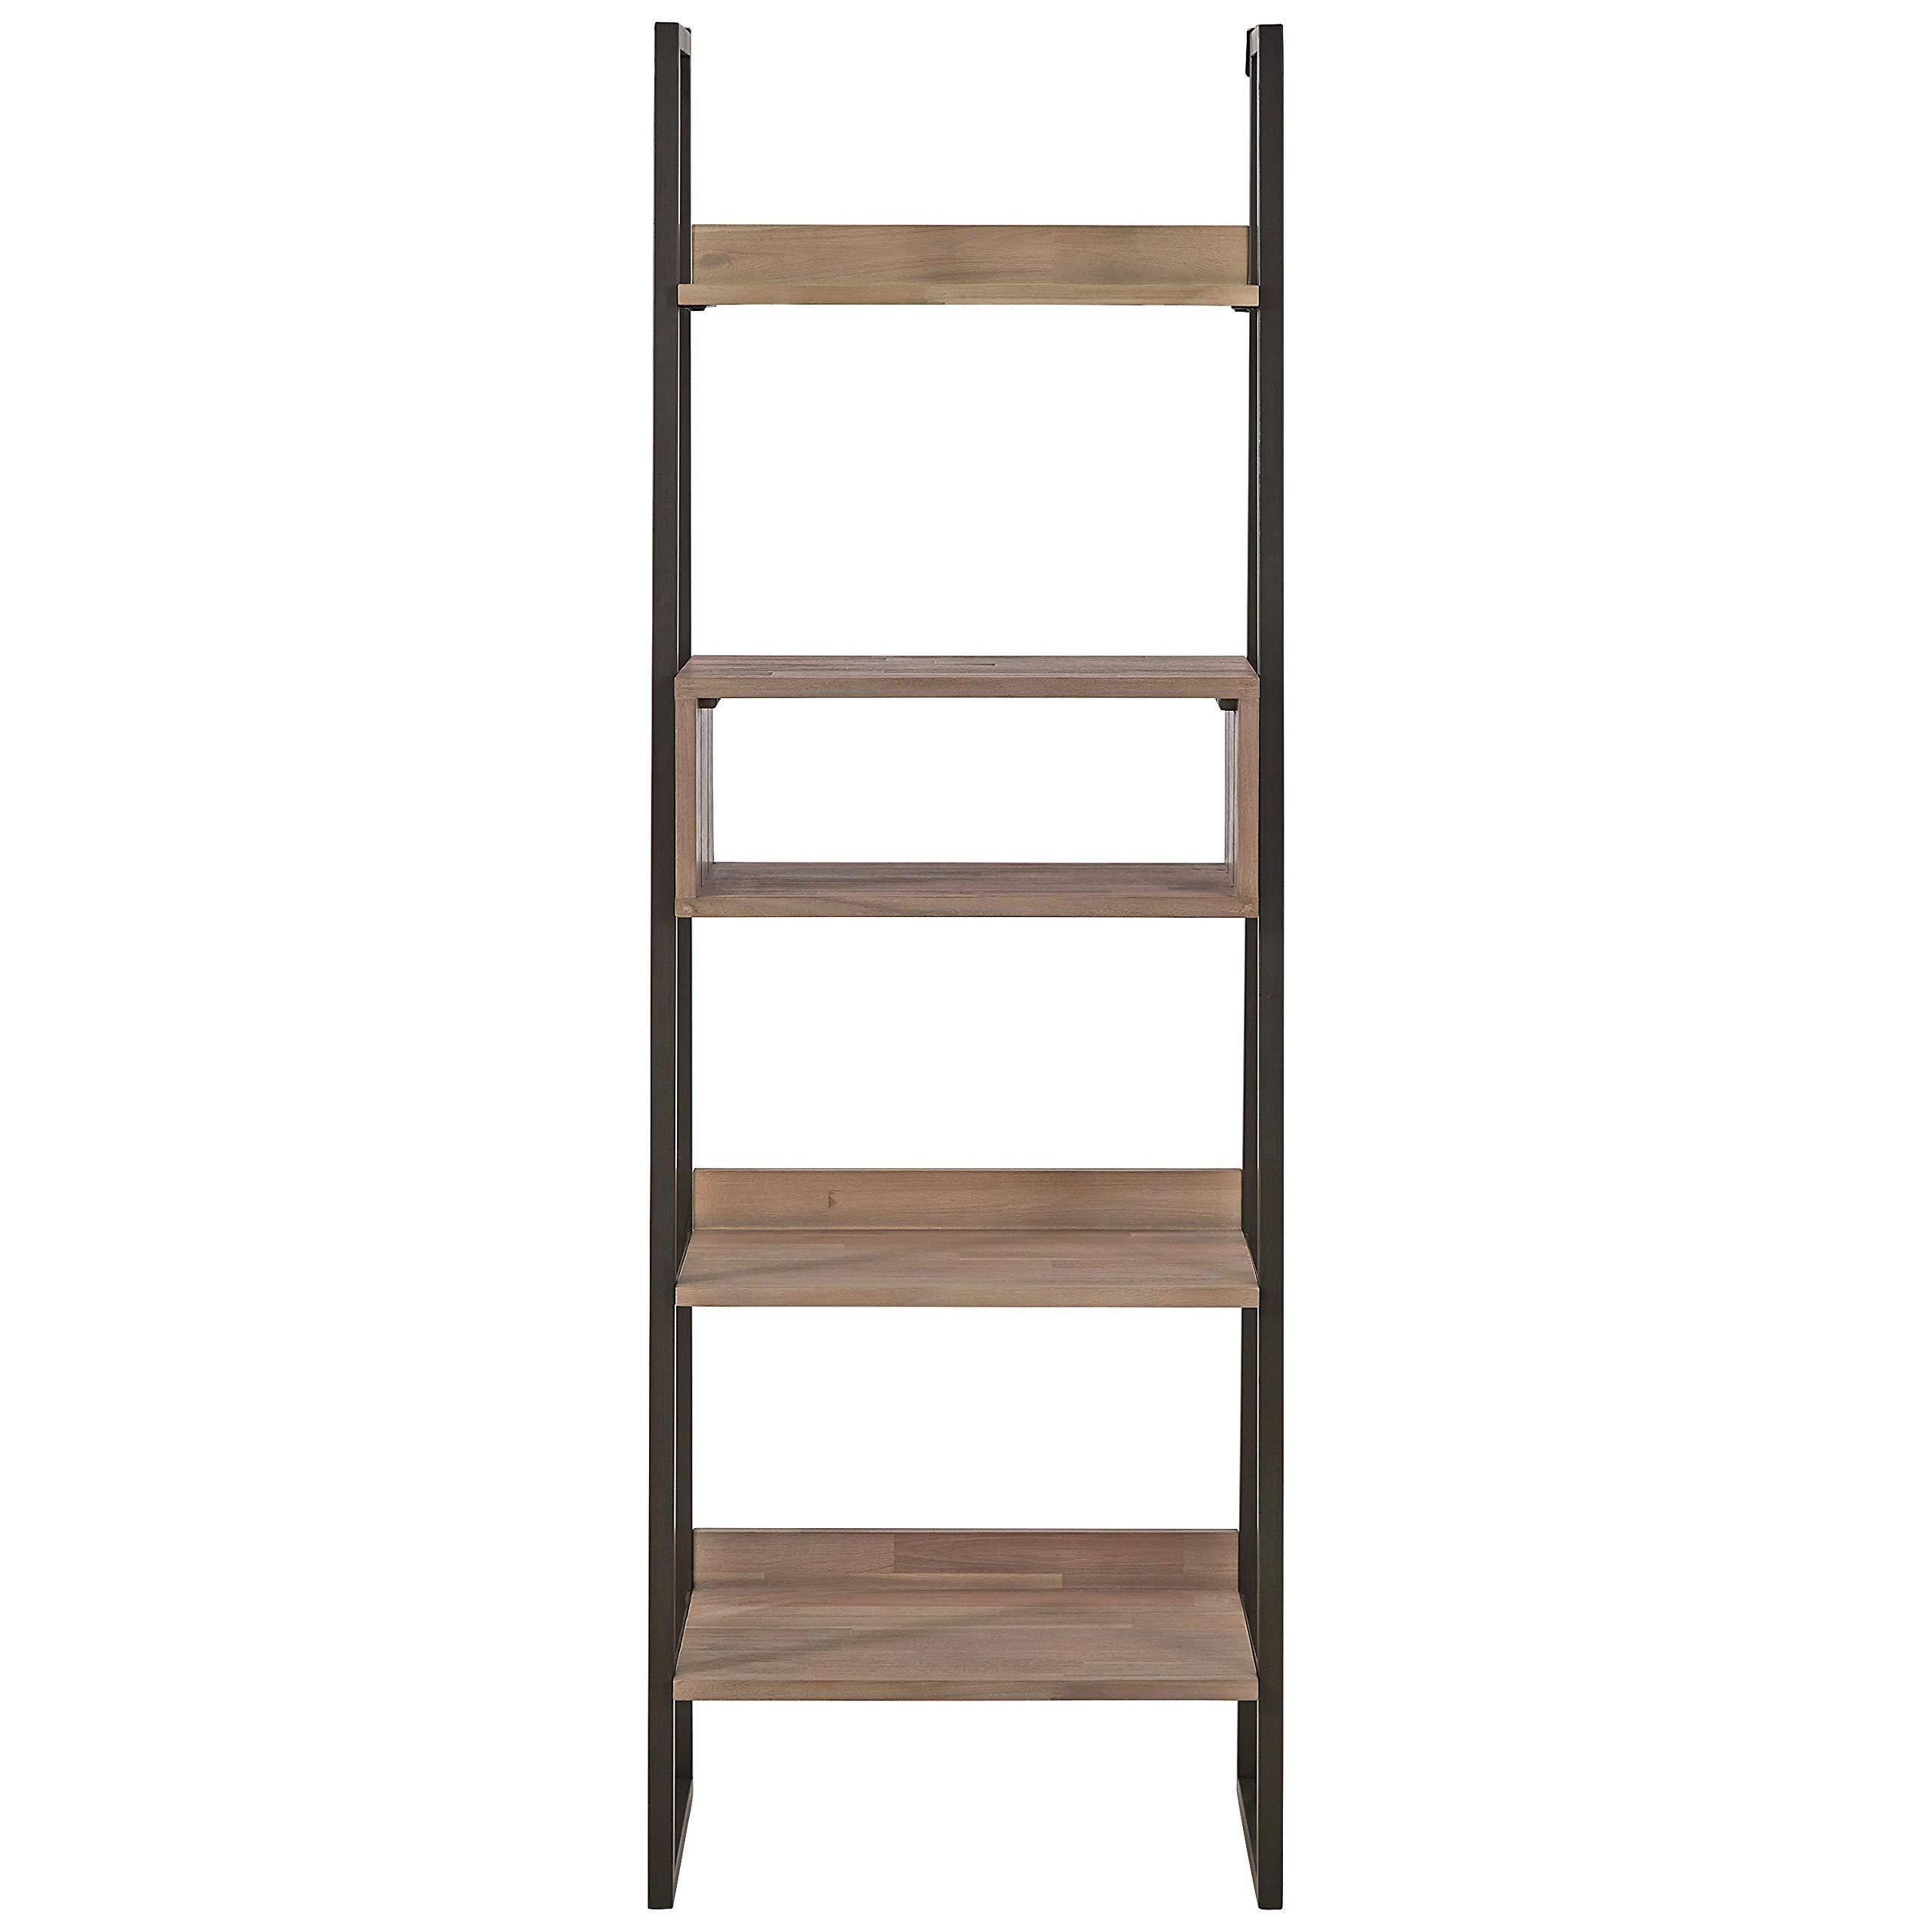 Rivet Roxmere Modern Bookcase, 23.6''W, Acacia, Sandblast Gray by Rivet (Image #3)